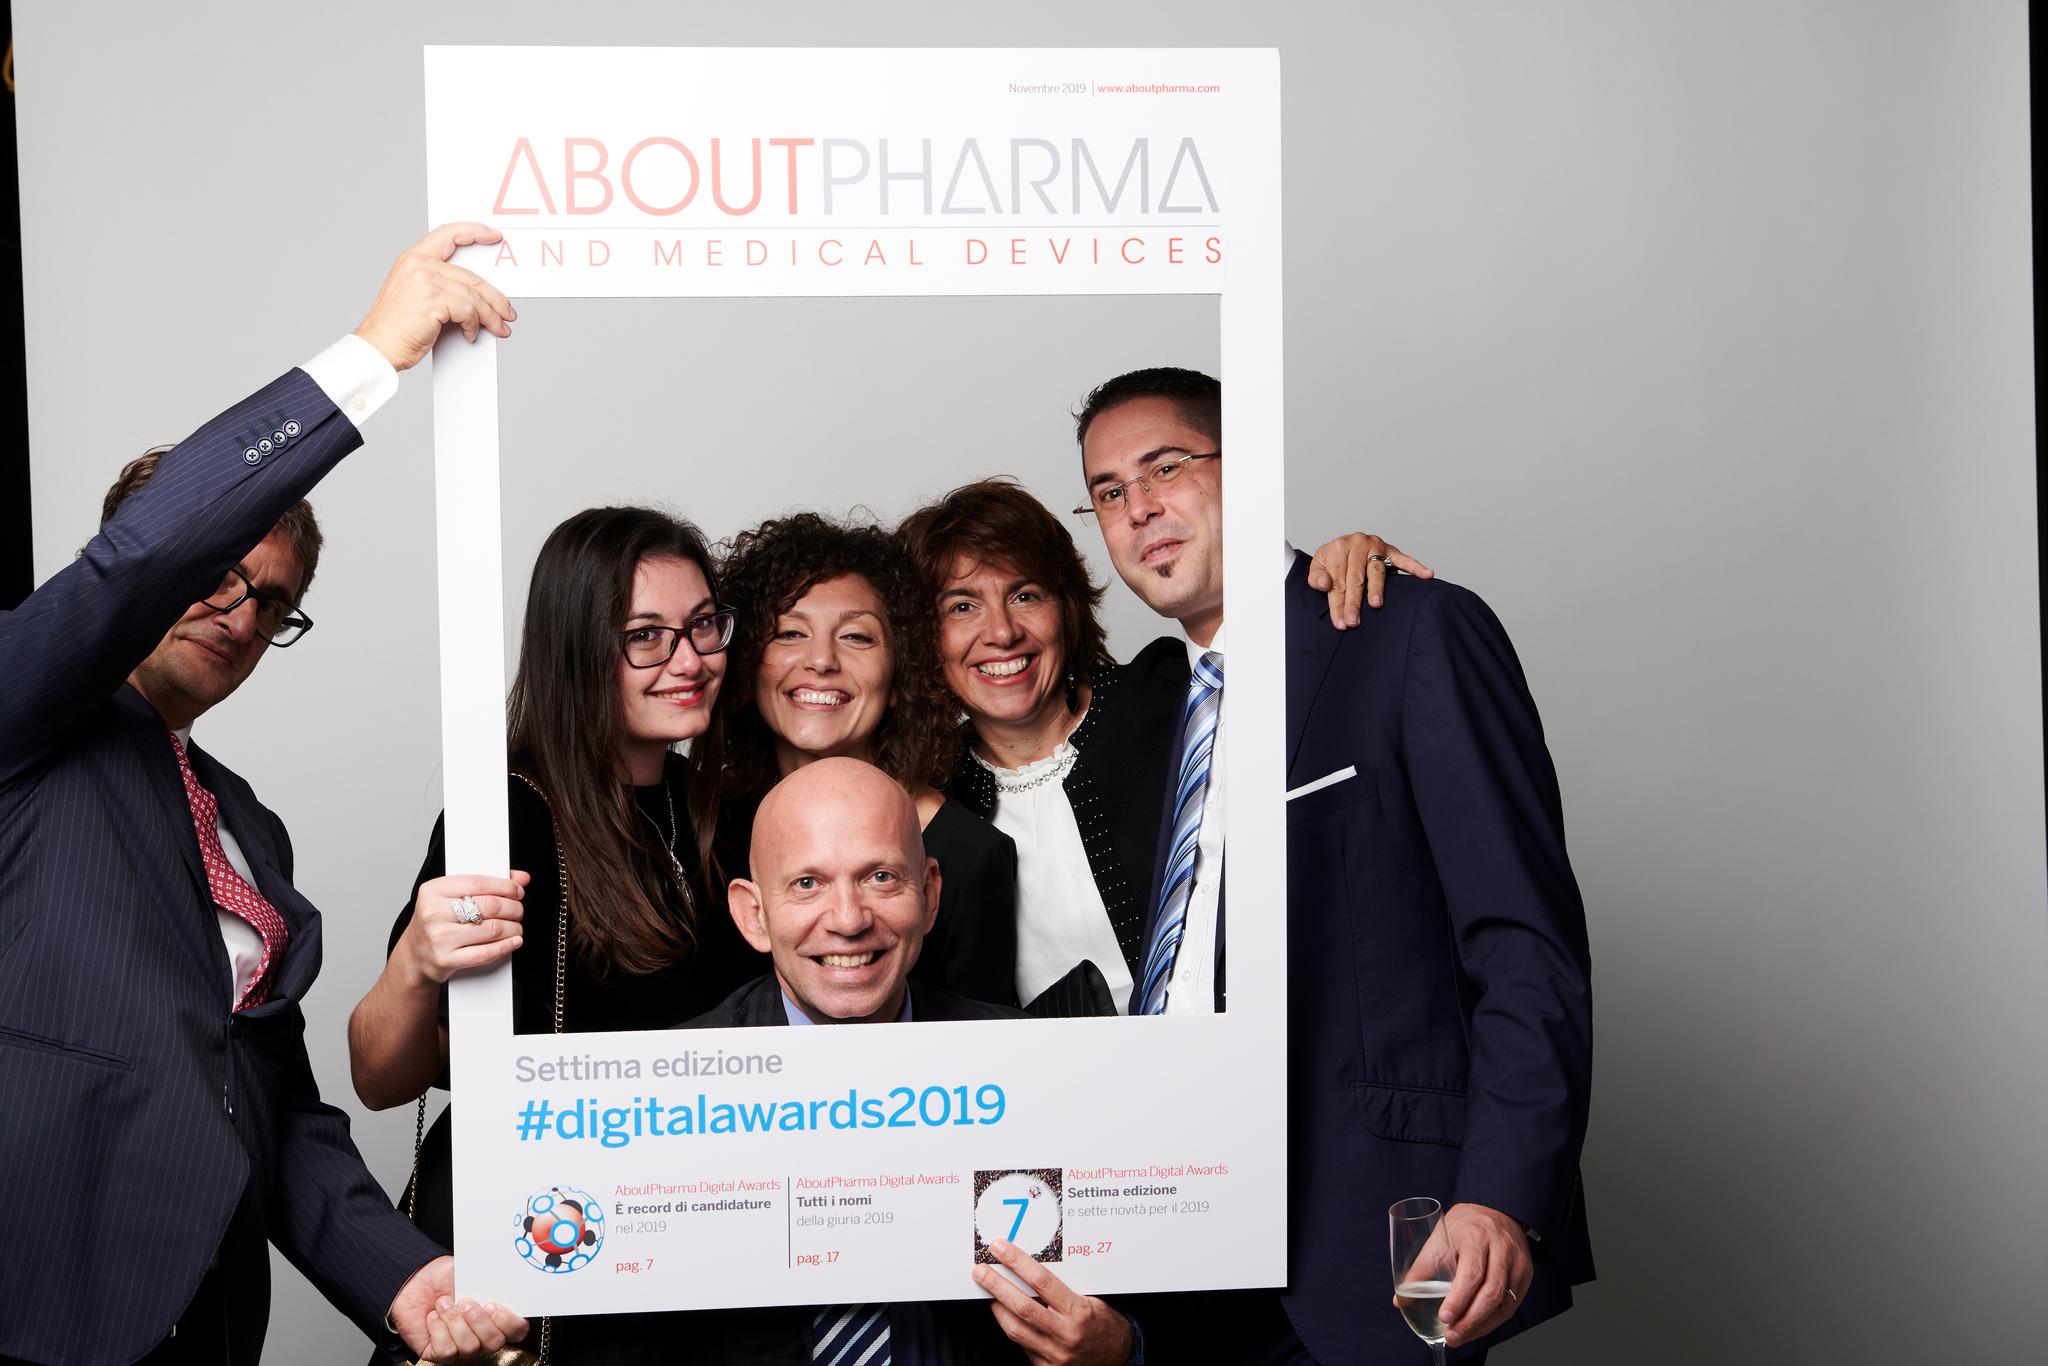 Photobooth AboutPharma Digital Awards 2019_11